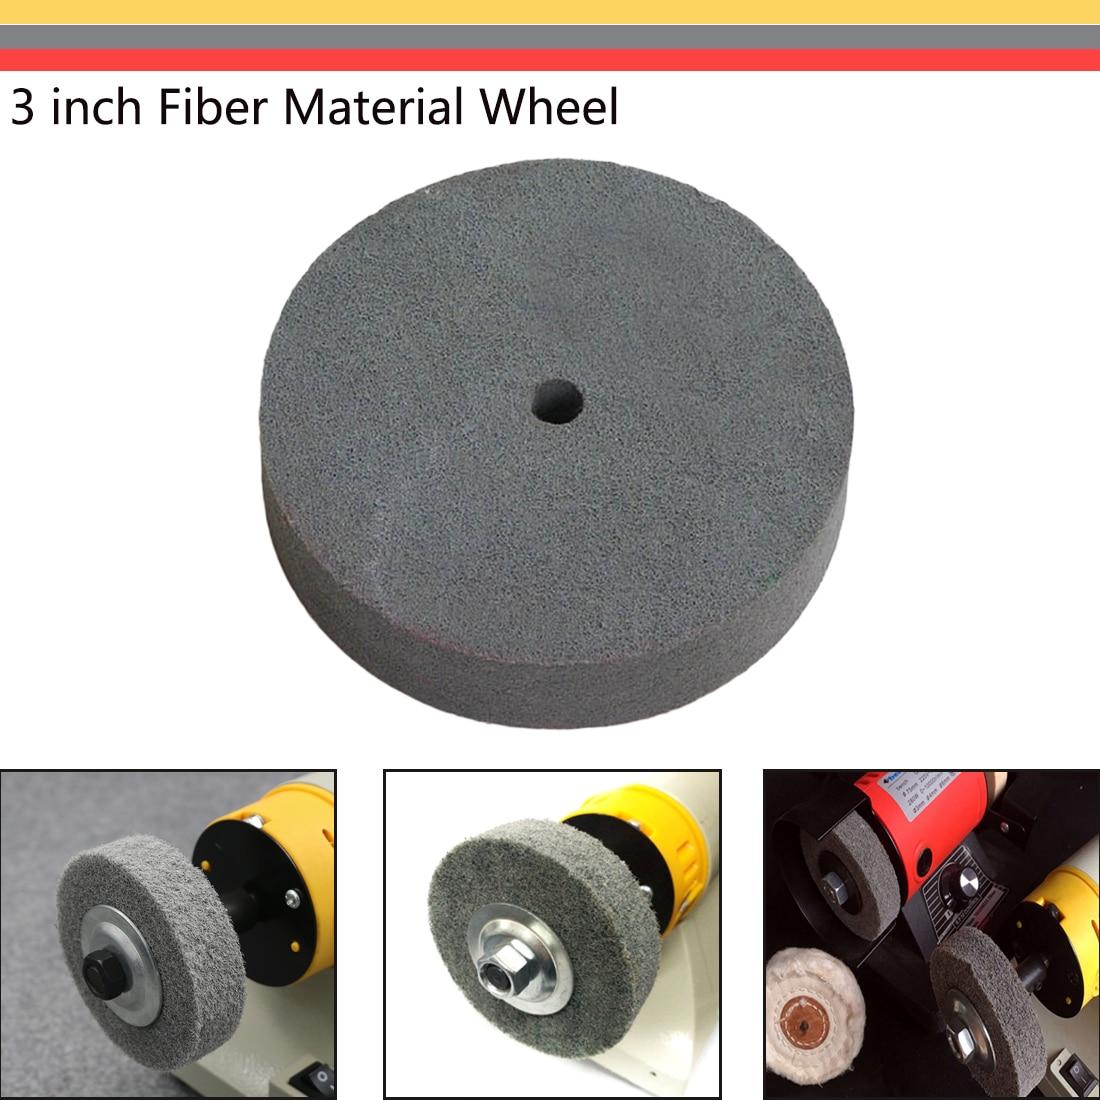 New Brand Original Import Abrasive Tool Polishing Tool 3 Inch Nylon Fiber Wheel Stainless Steel Table Mill Grinding Accessories